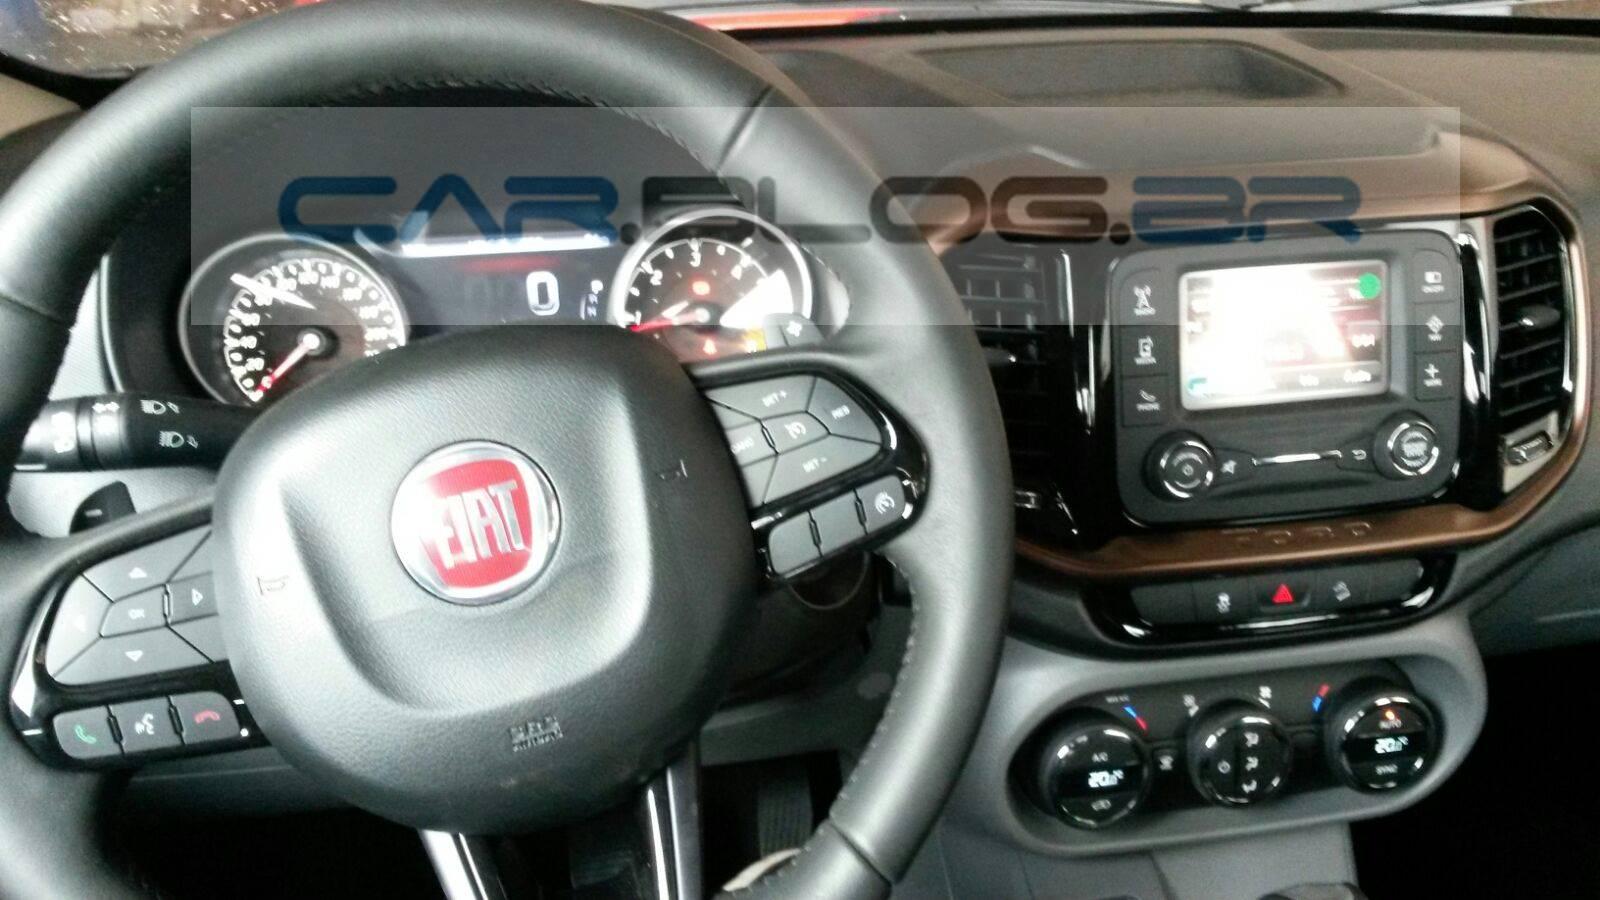 Fiat Toro Freedom 1.8 Flex Automática - interior